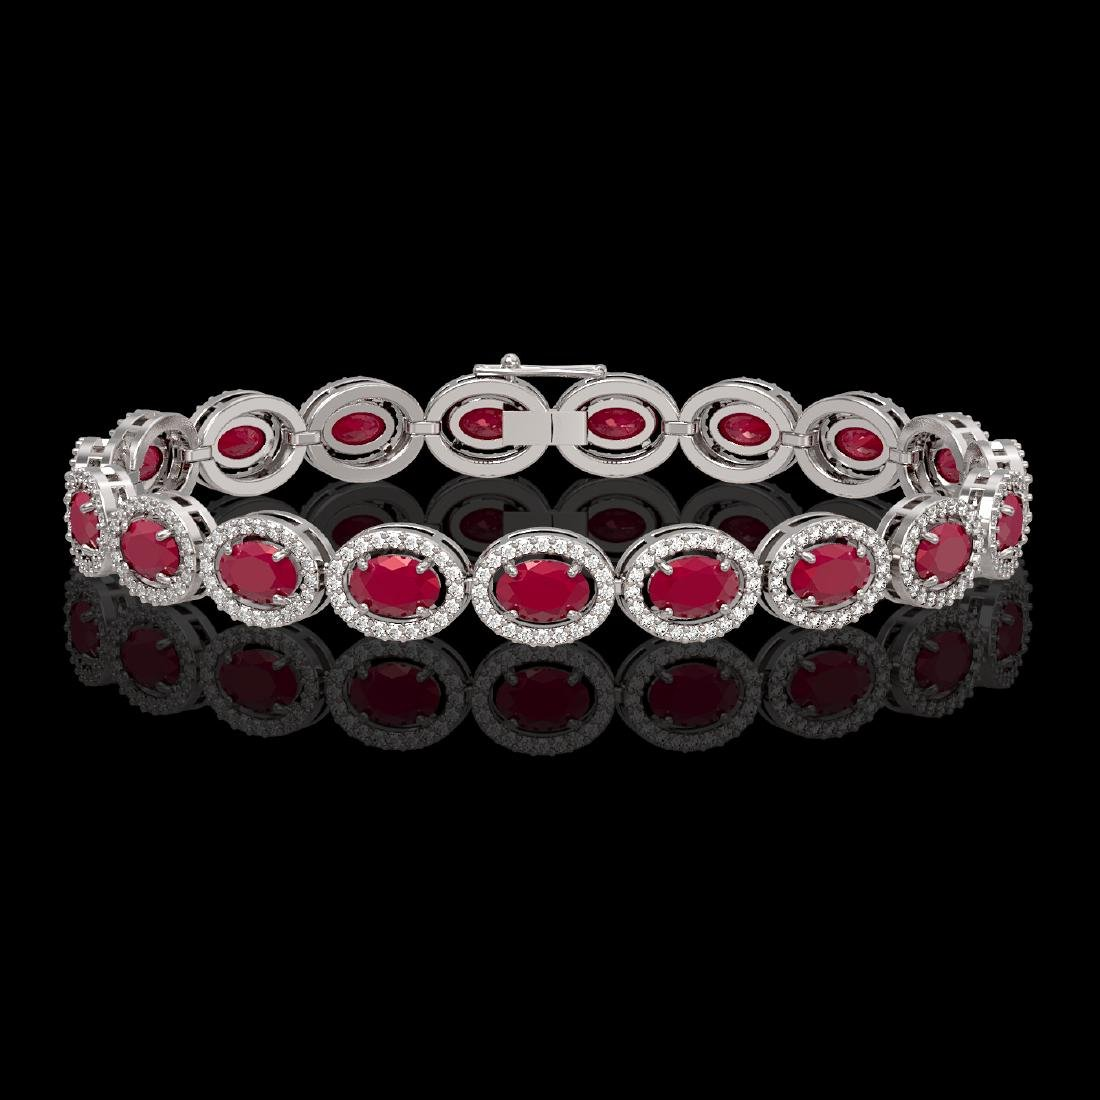 15.2 CTW Ruby & Diamond Halo Bracelet 10K White Gold